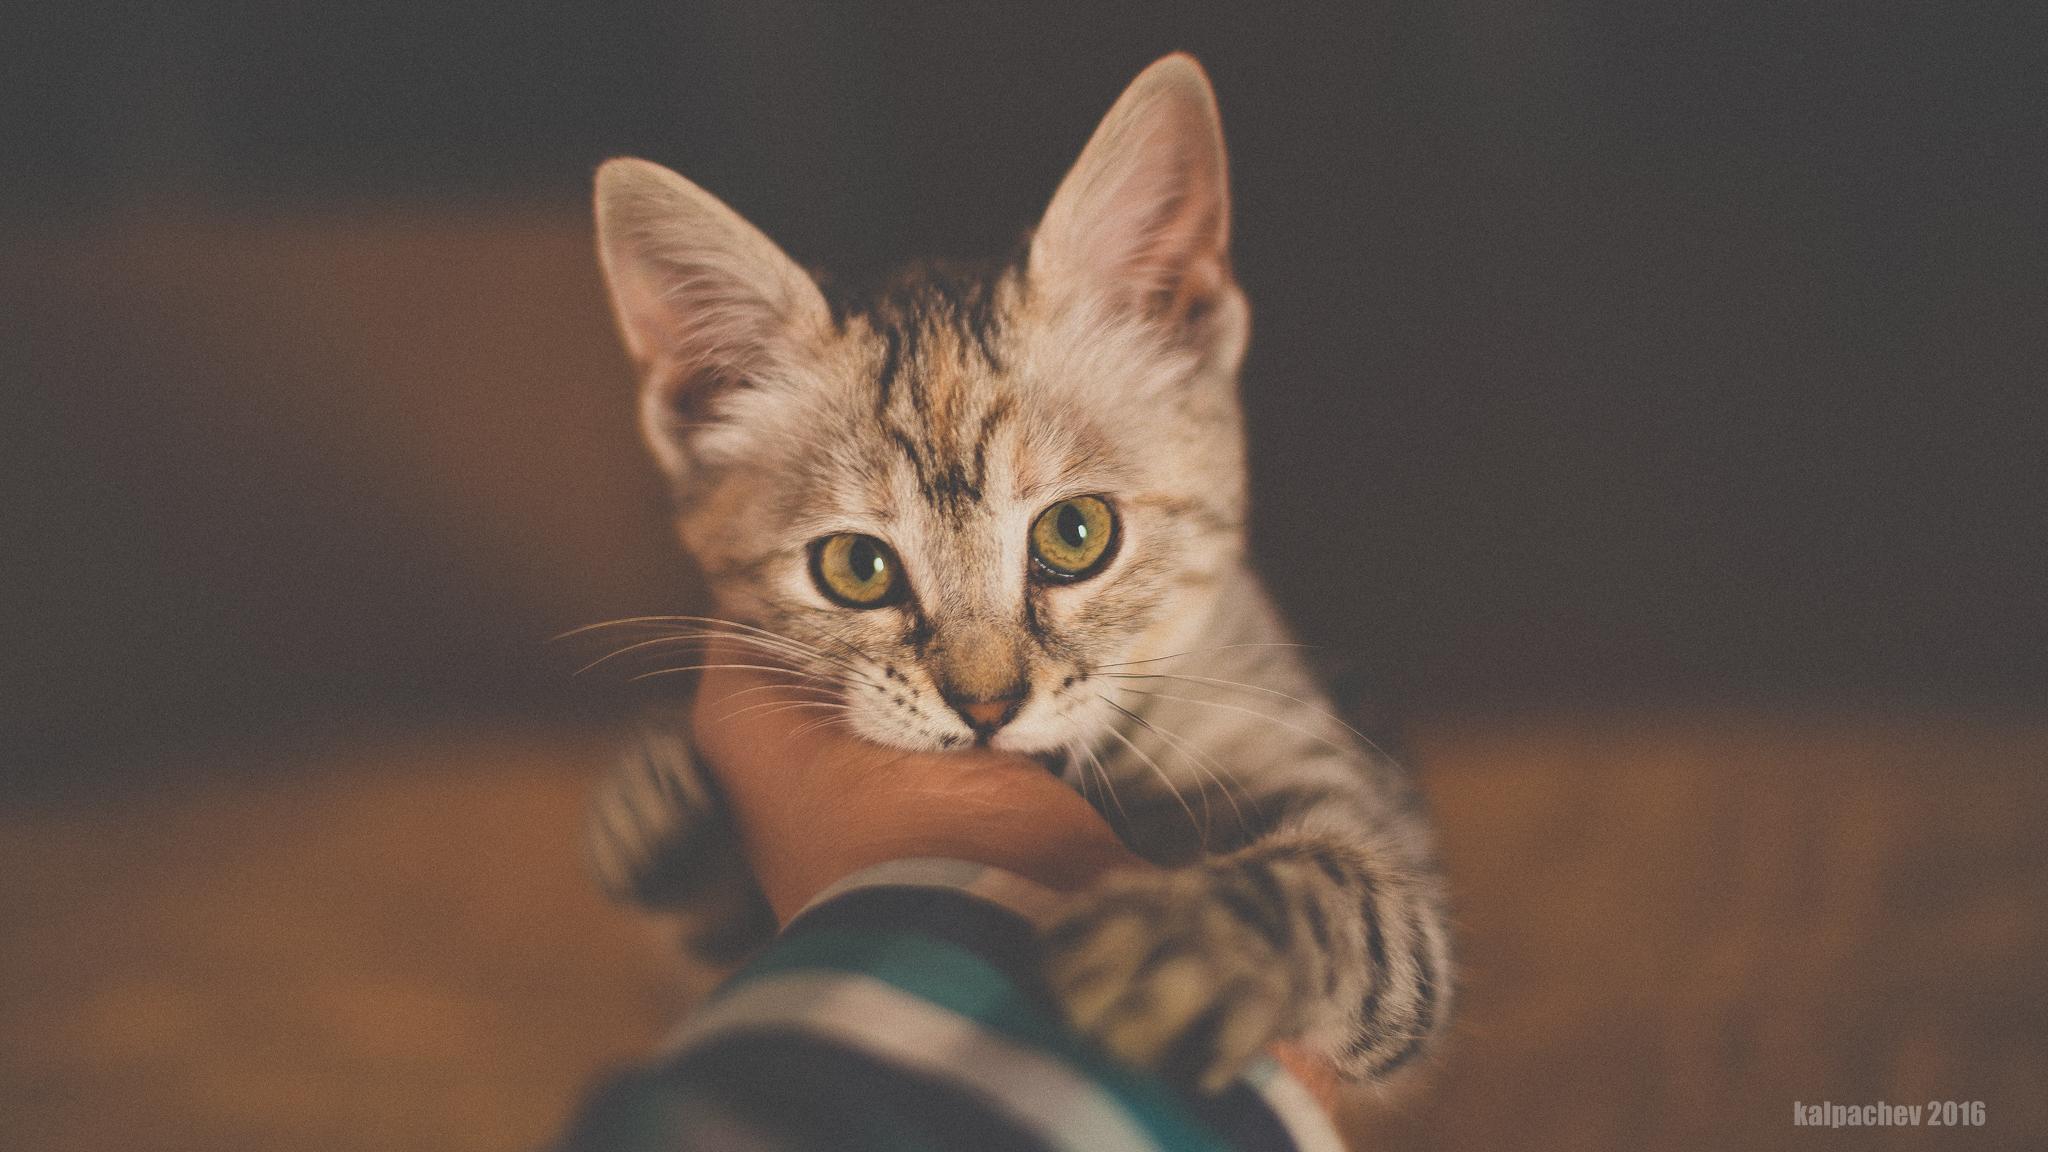 My new model #cat #animal